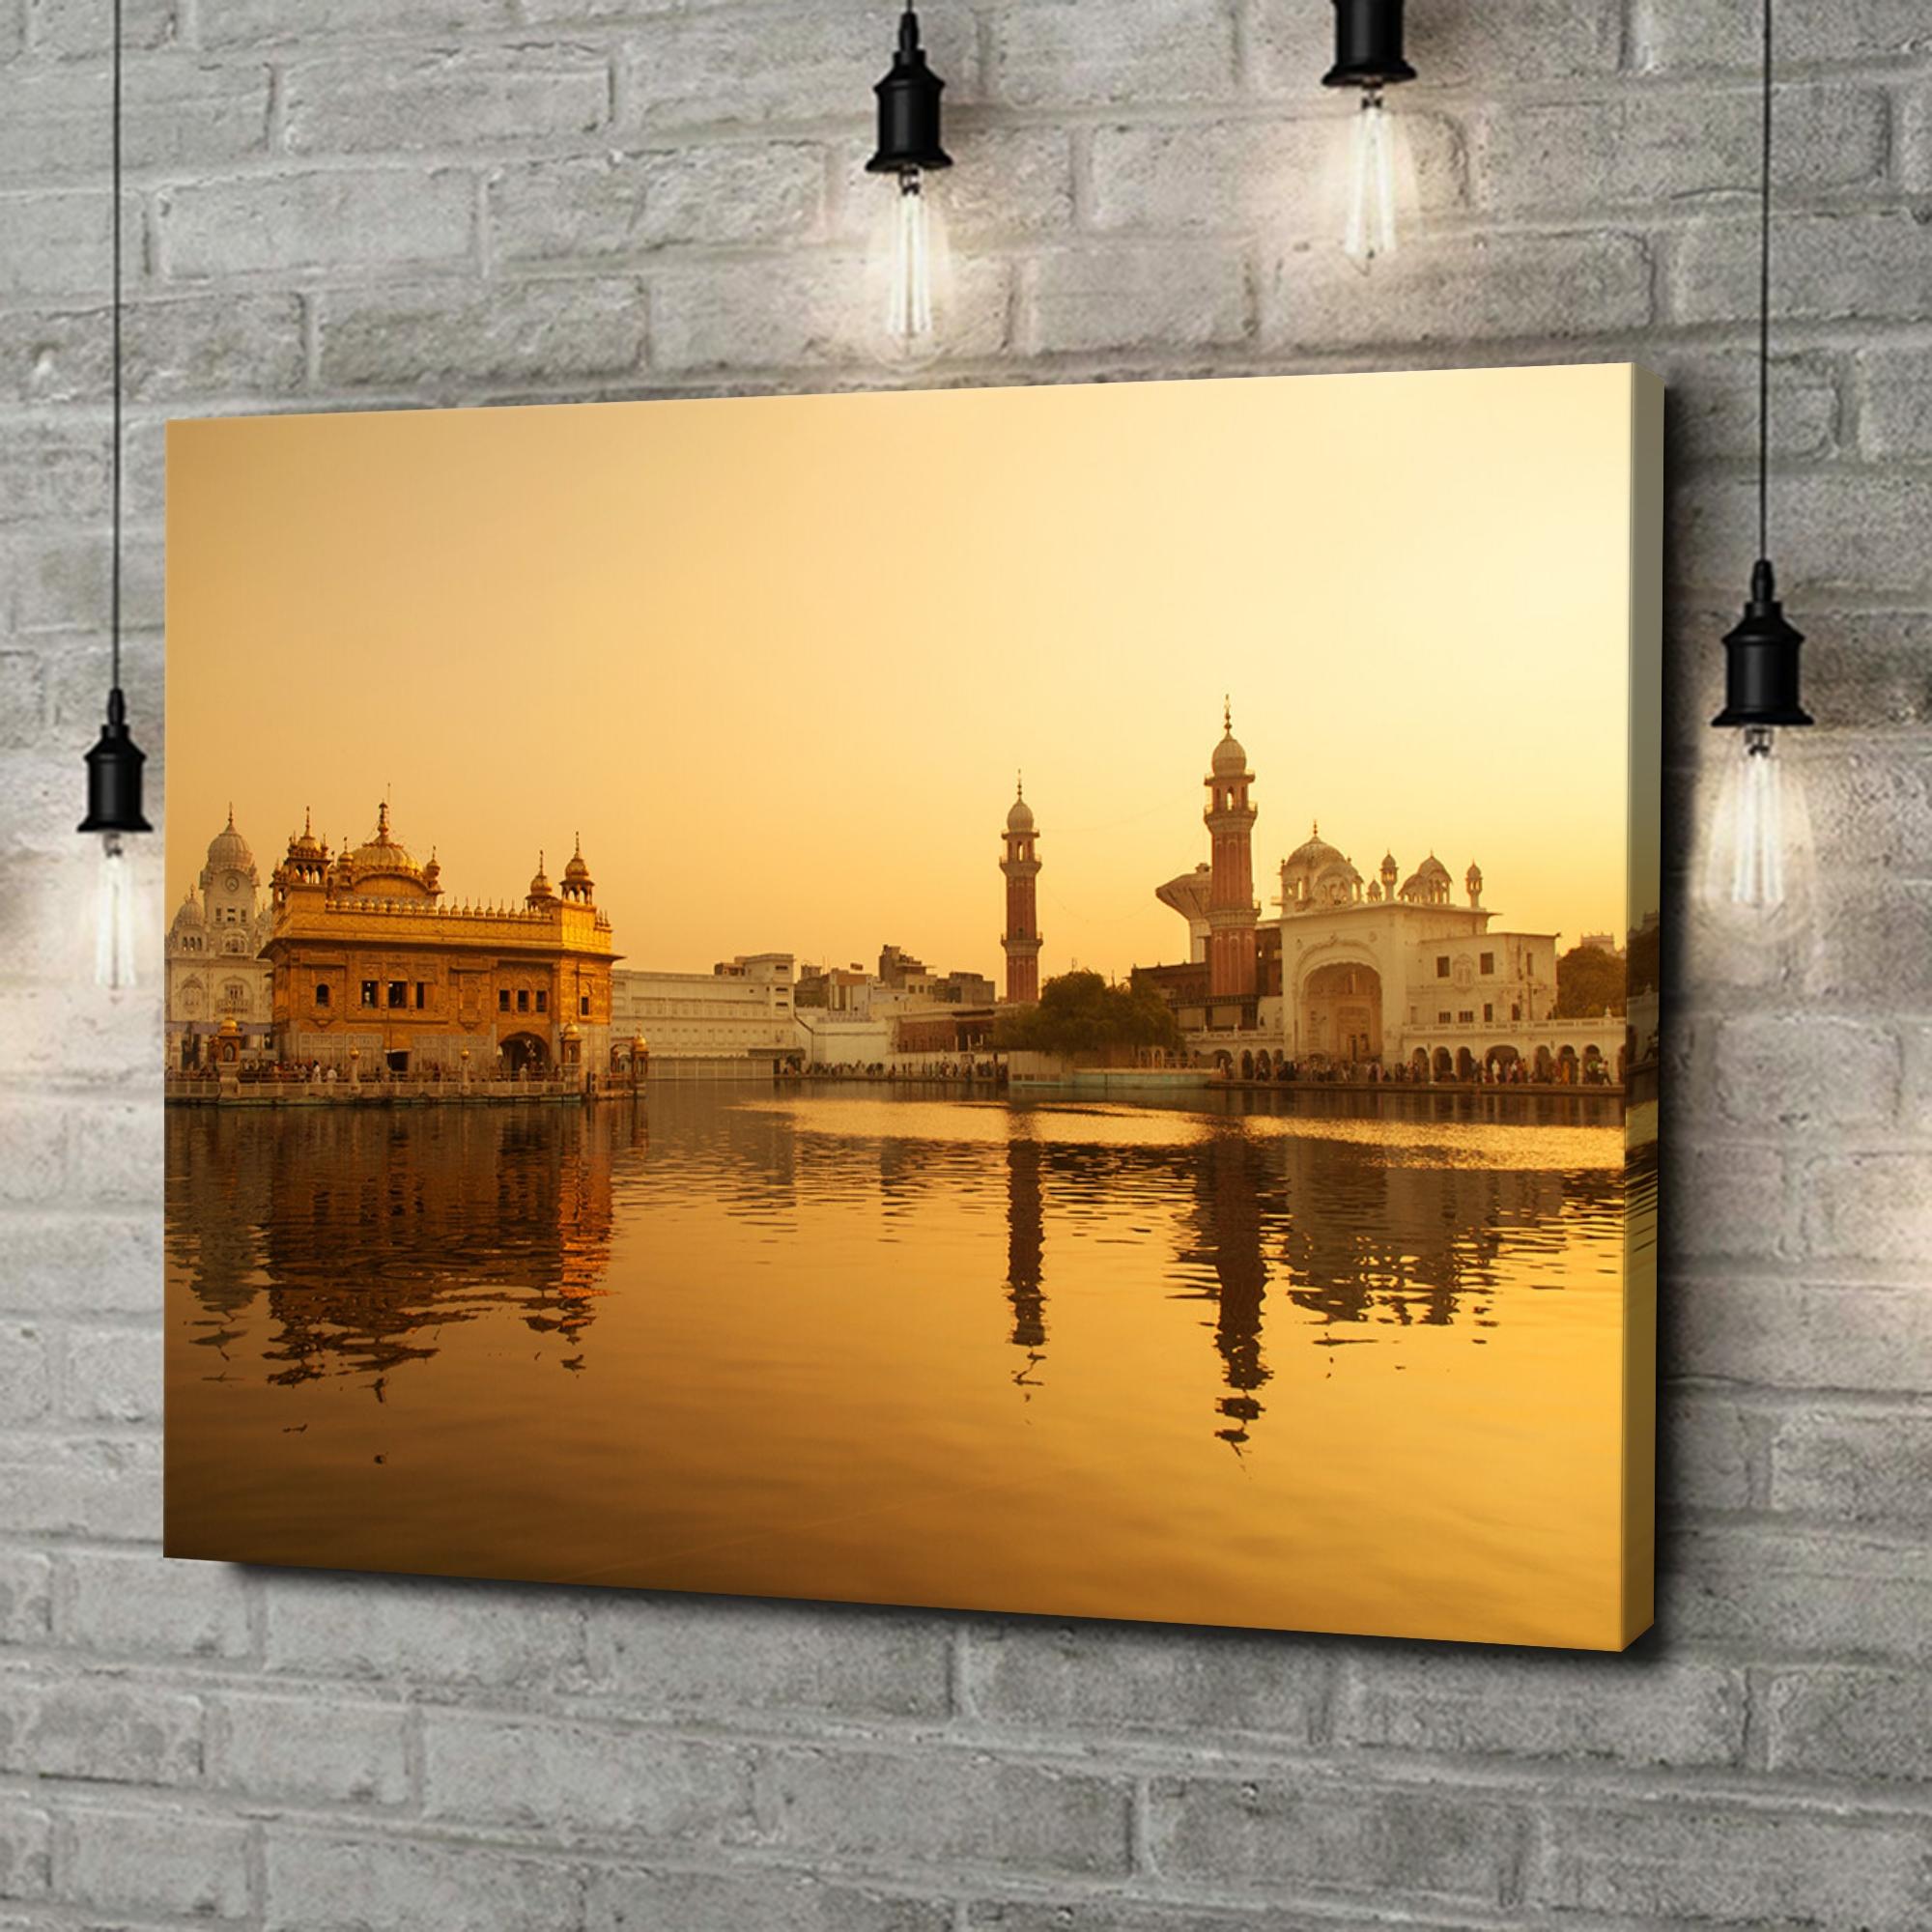 Leinwandbild personalisiert Goldener Tempel Amritsar Punjab Indien